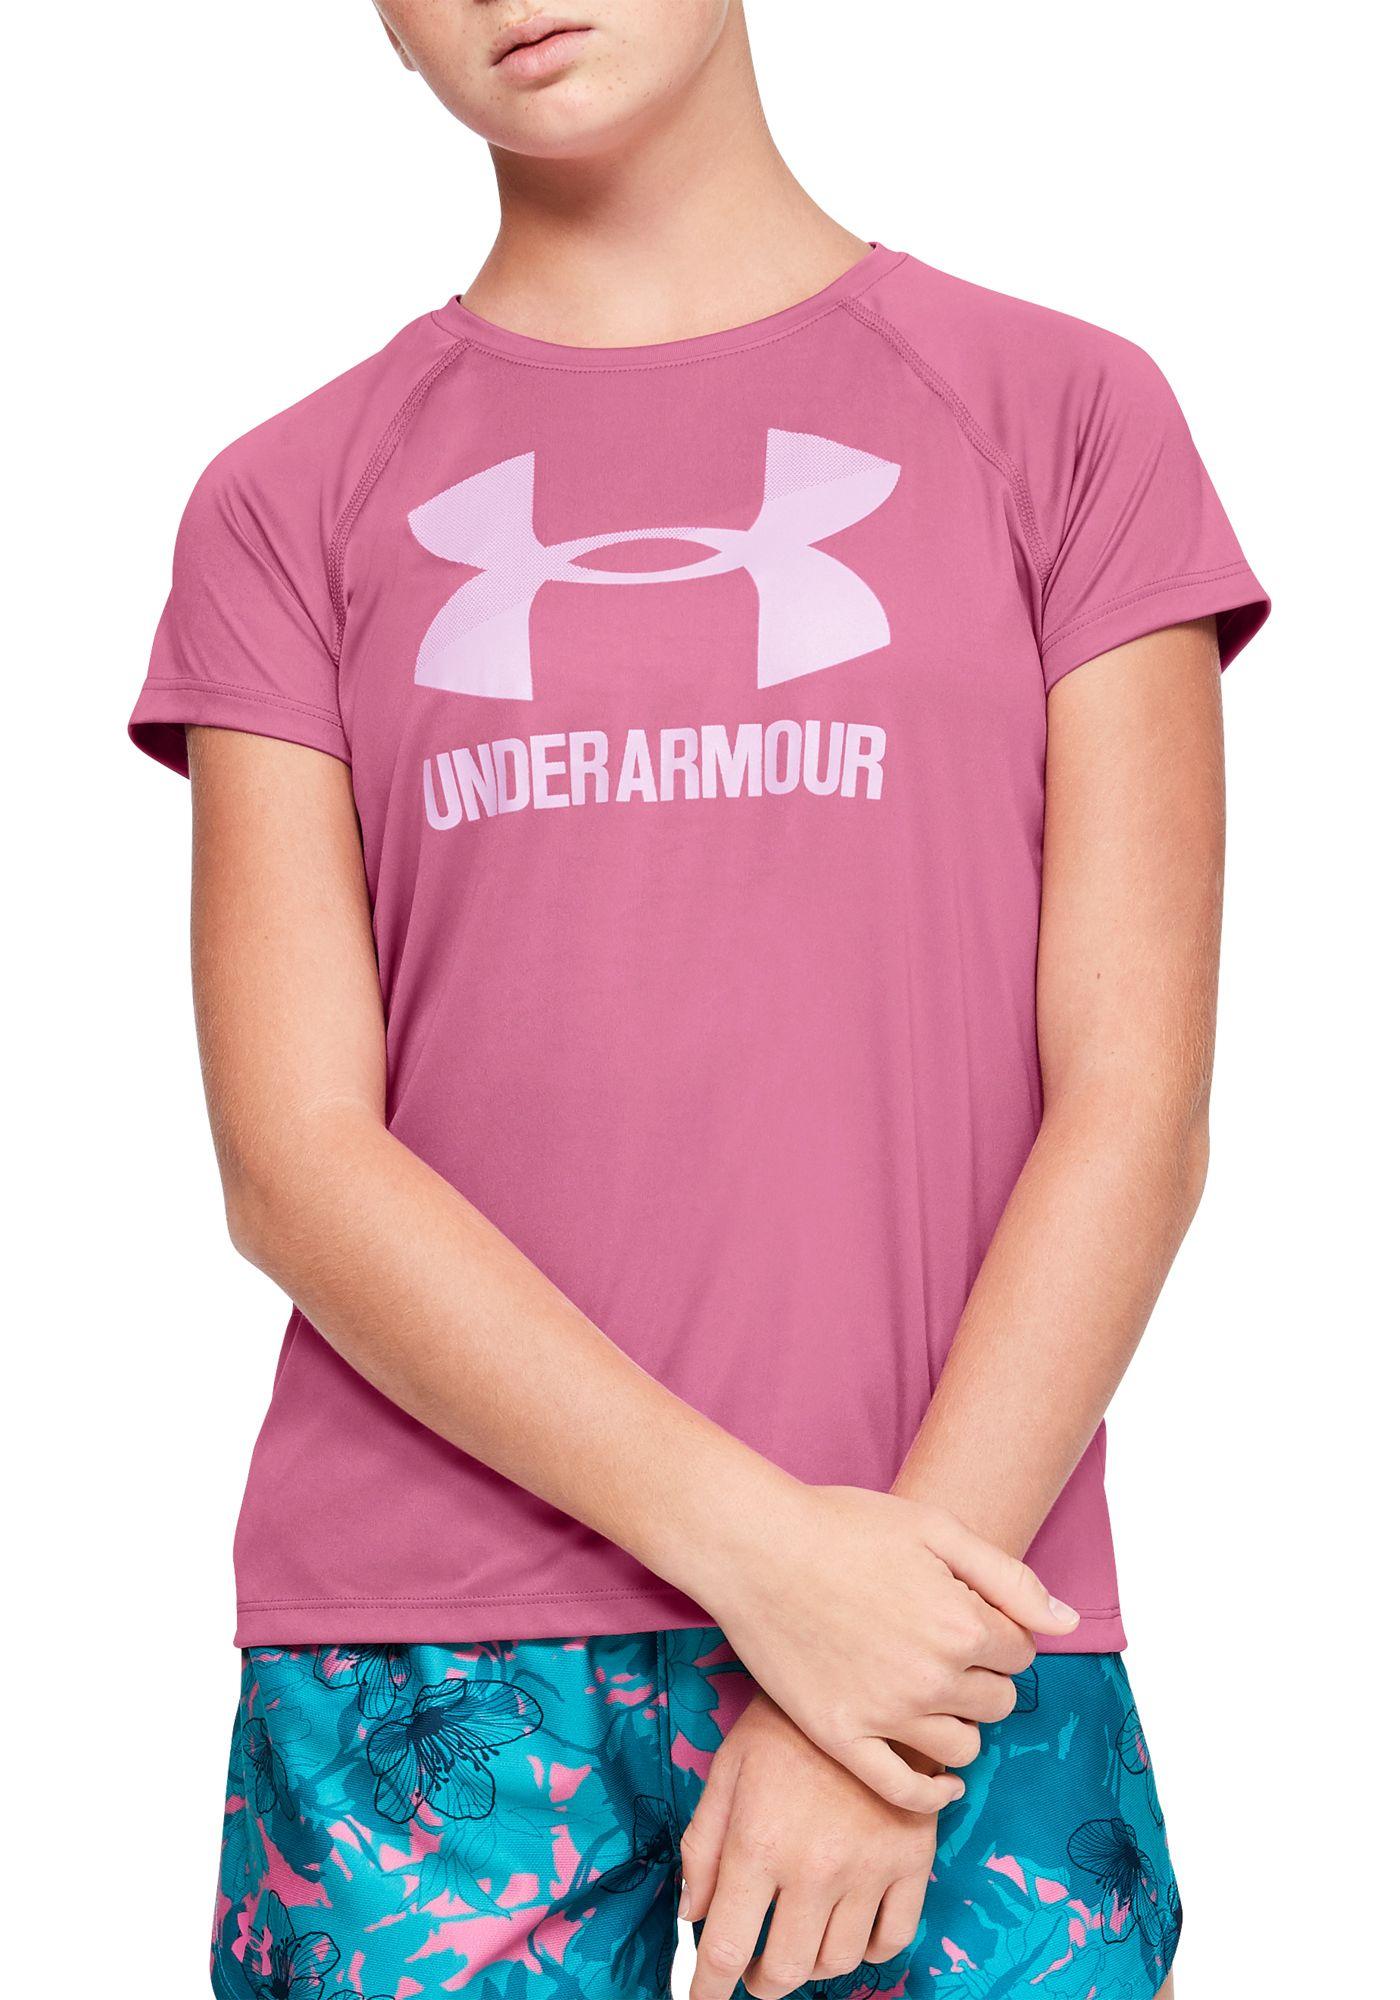 Under Armour Girls' Solid Big Logo T-Shirt